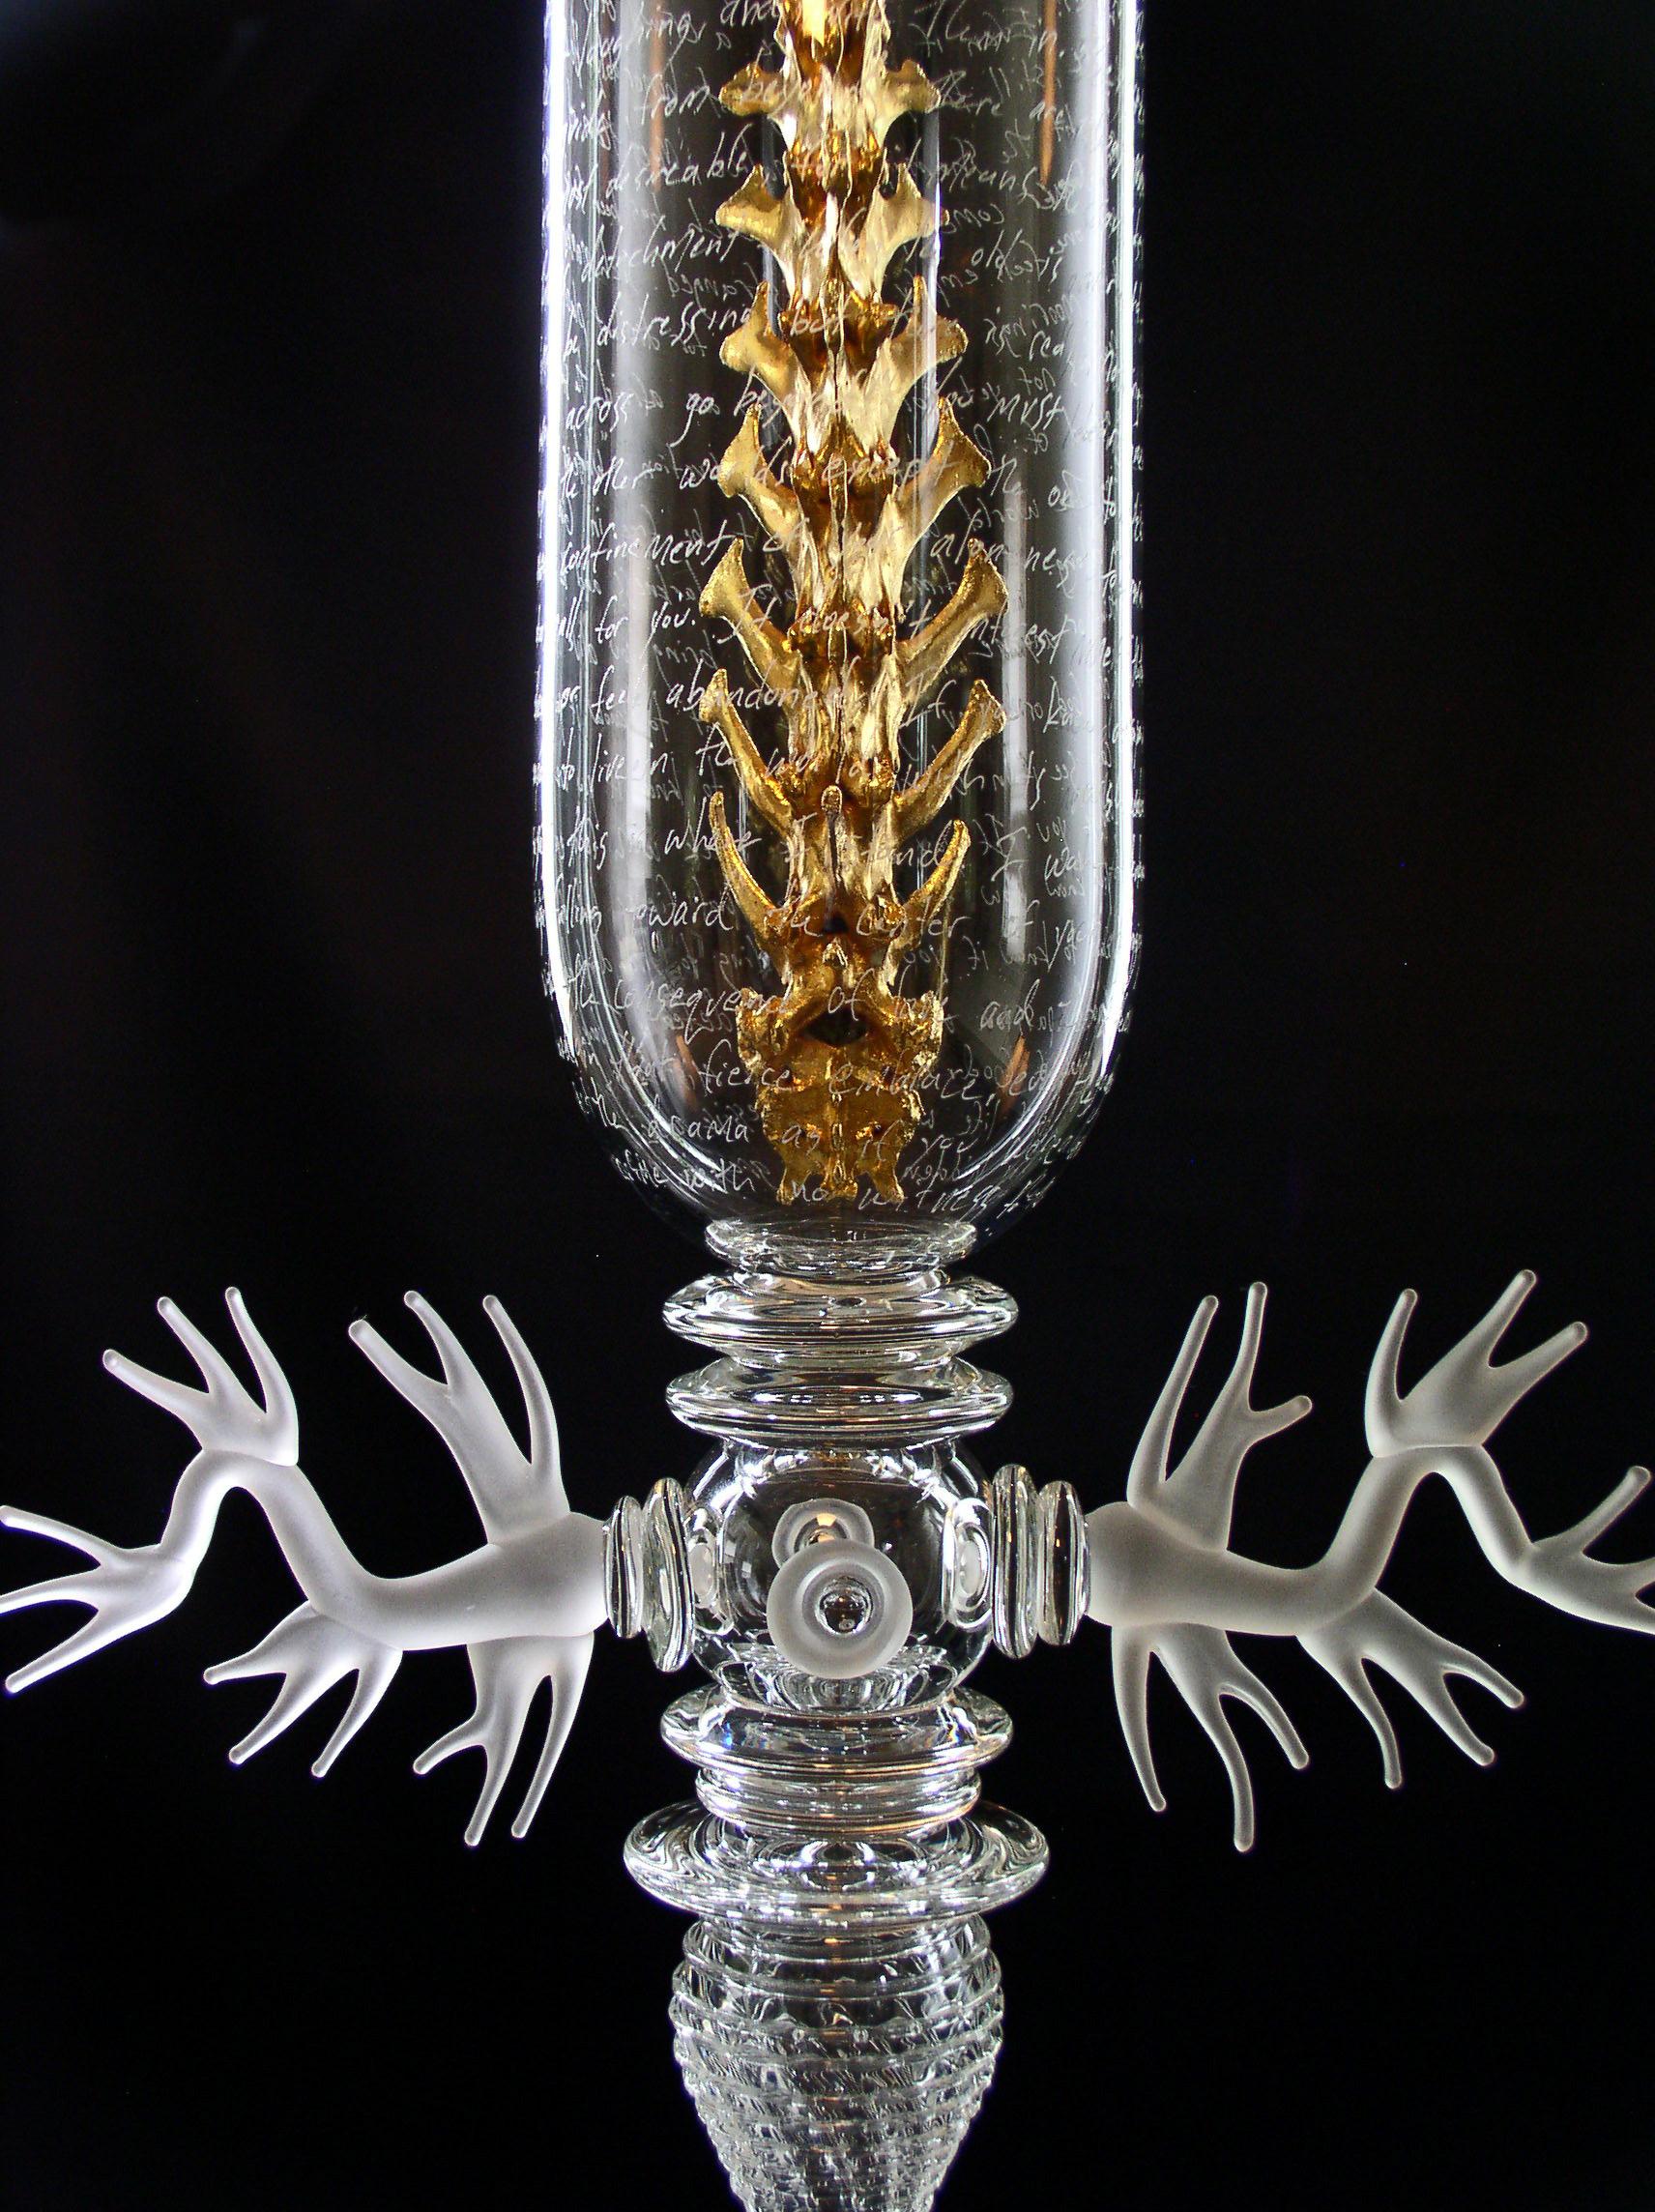 Spine jar detail